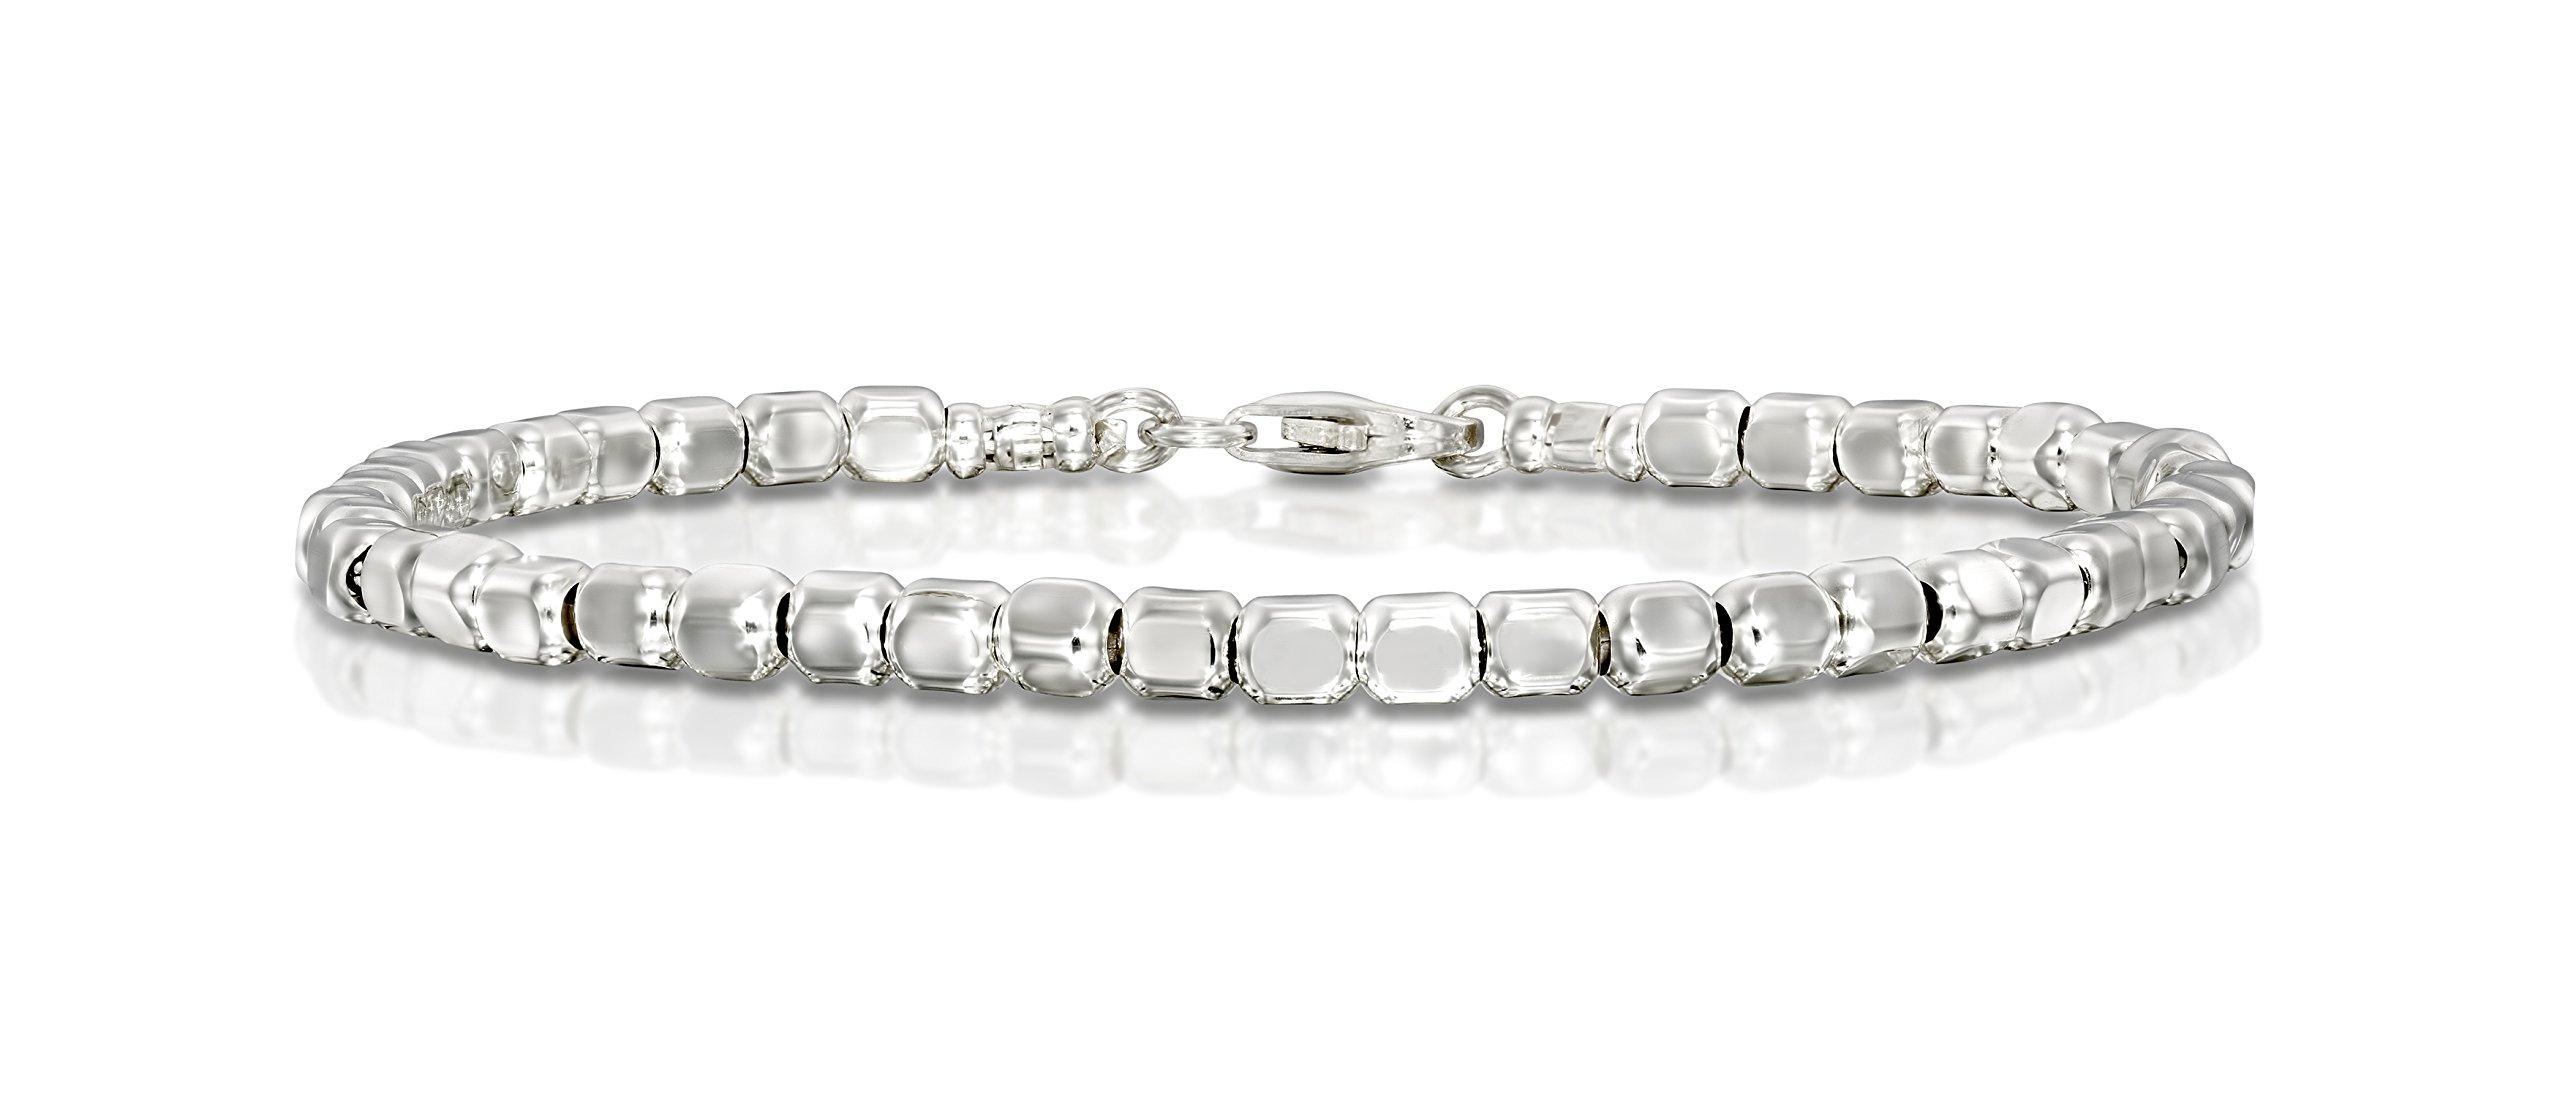 Women's Square Beads Bracelet Dazzling 925 Sterling Silver Beaded Bracelet, 7''